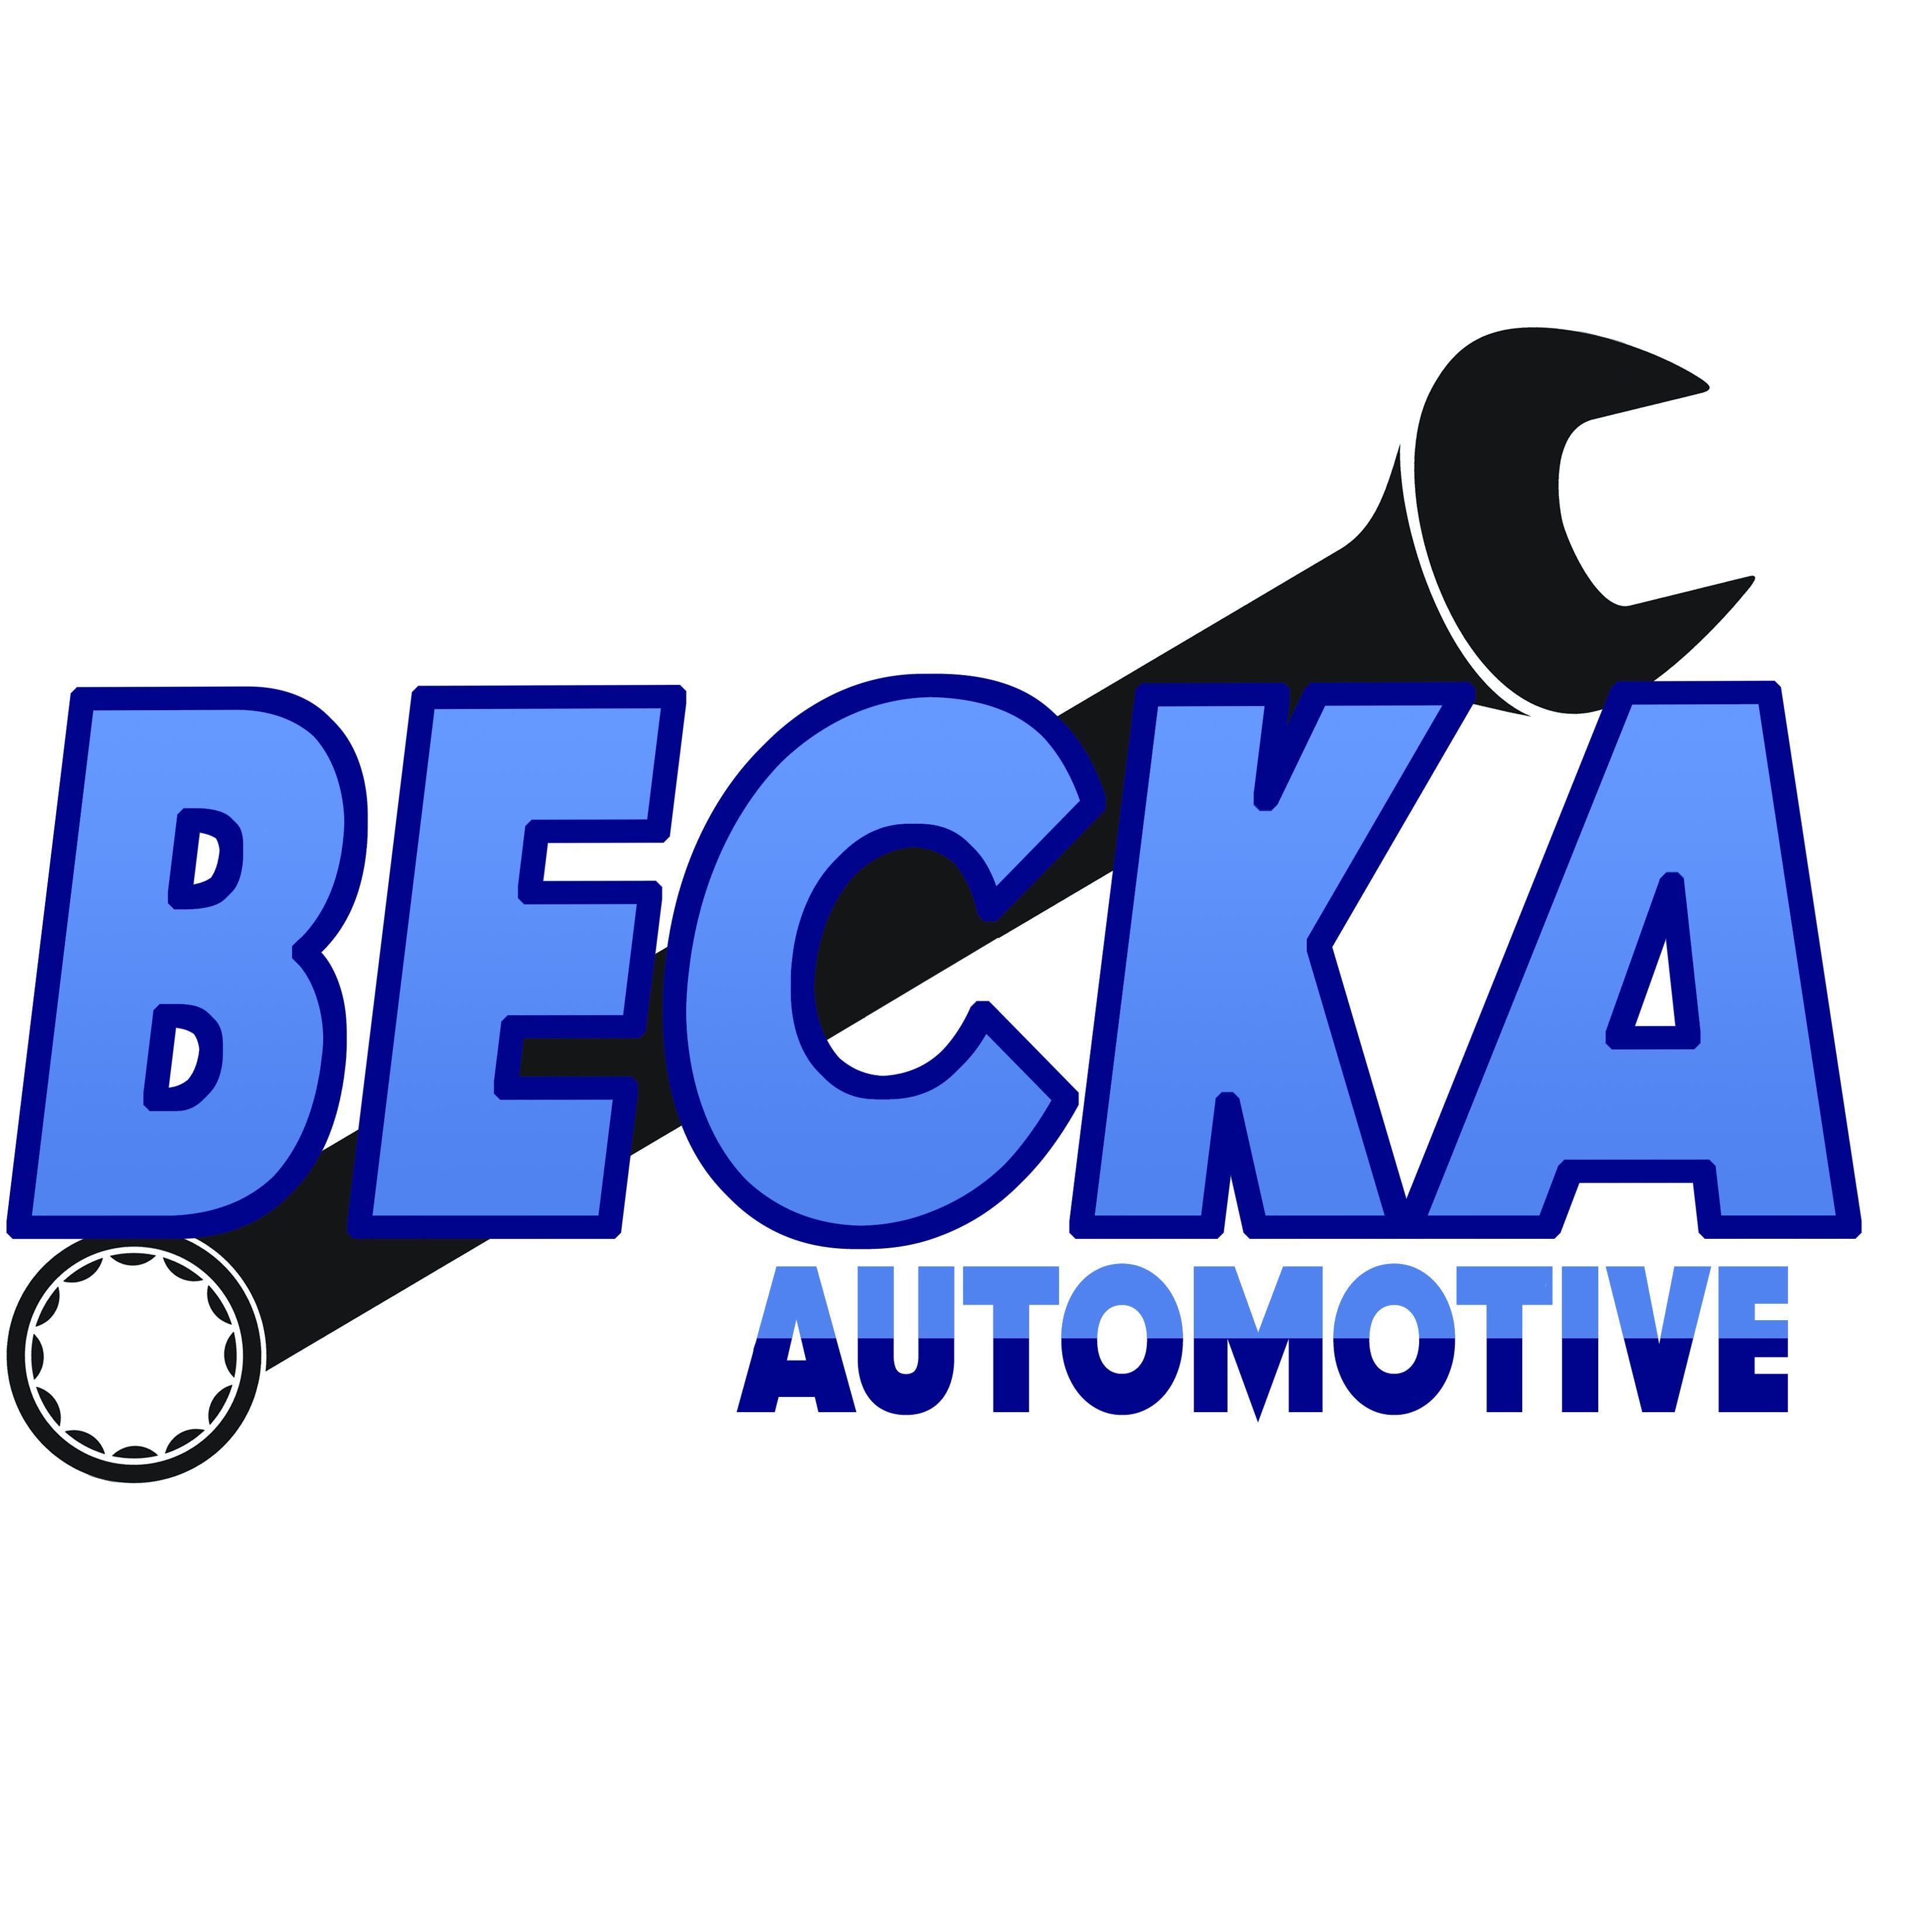 Becka Automotive Logo